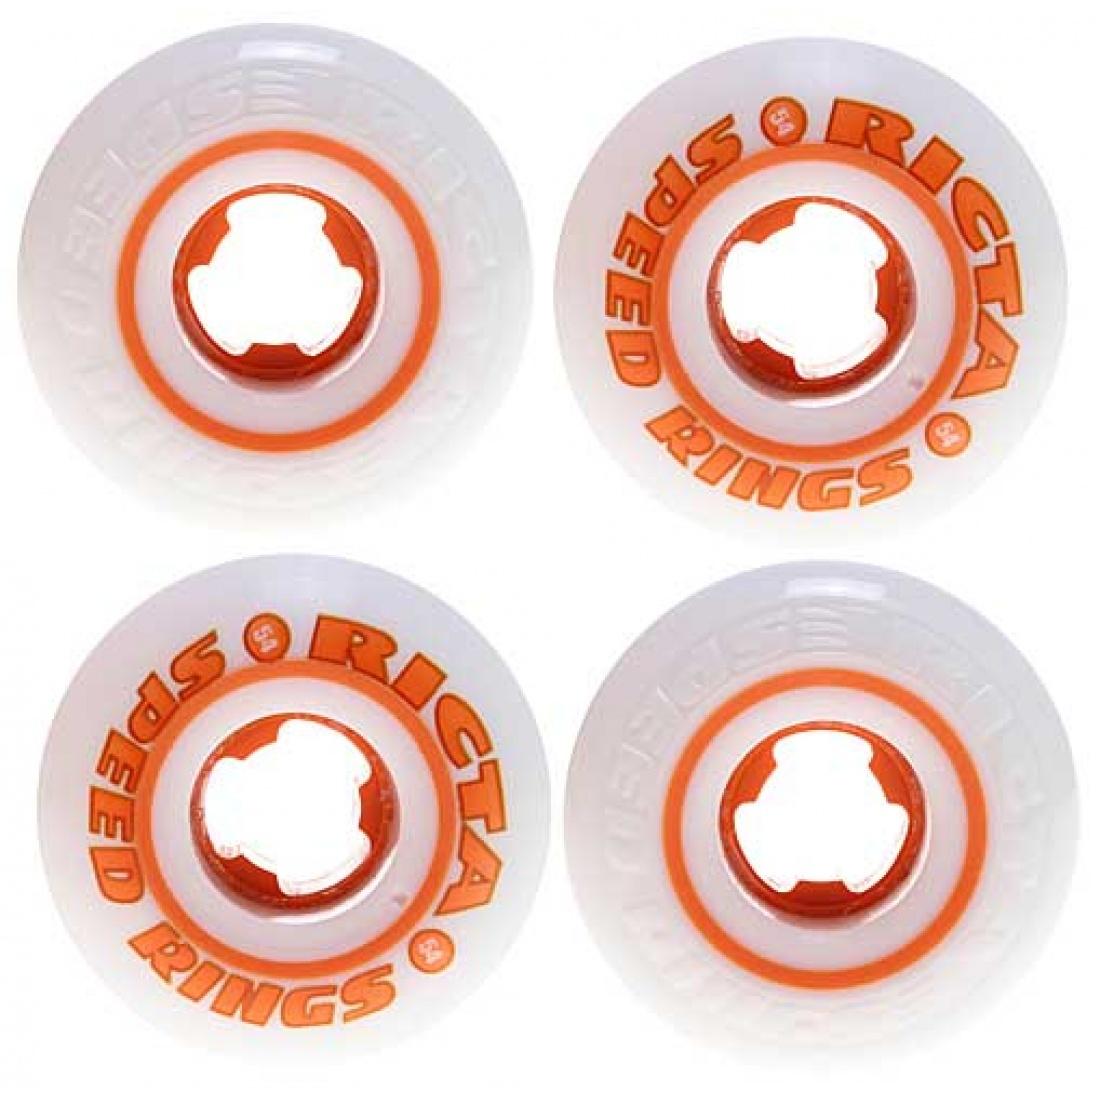 RCA-Speedrings 81b White/Orange 54mm (Set of 4)